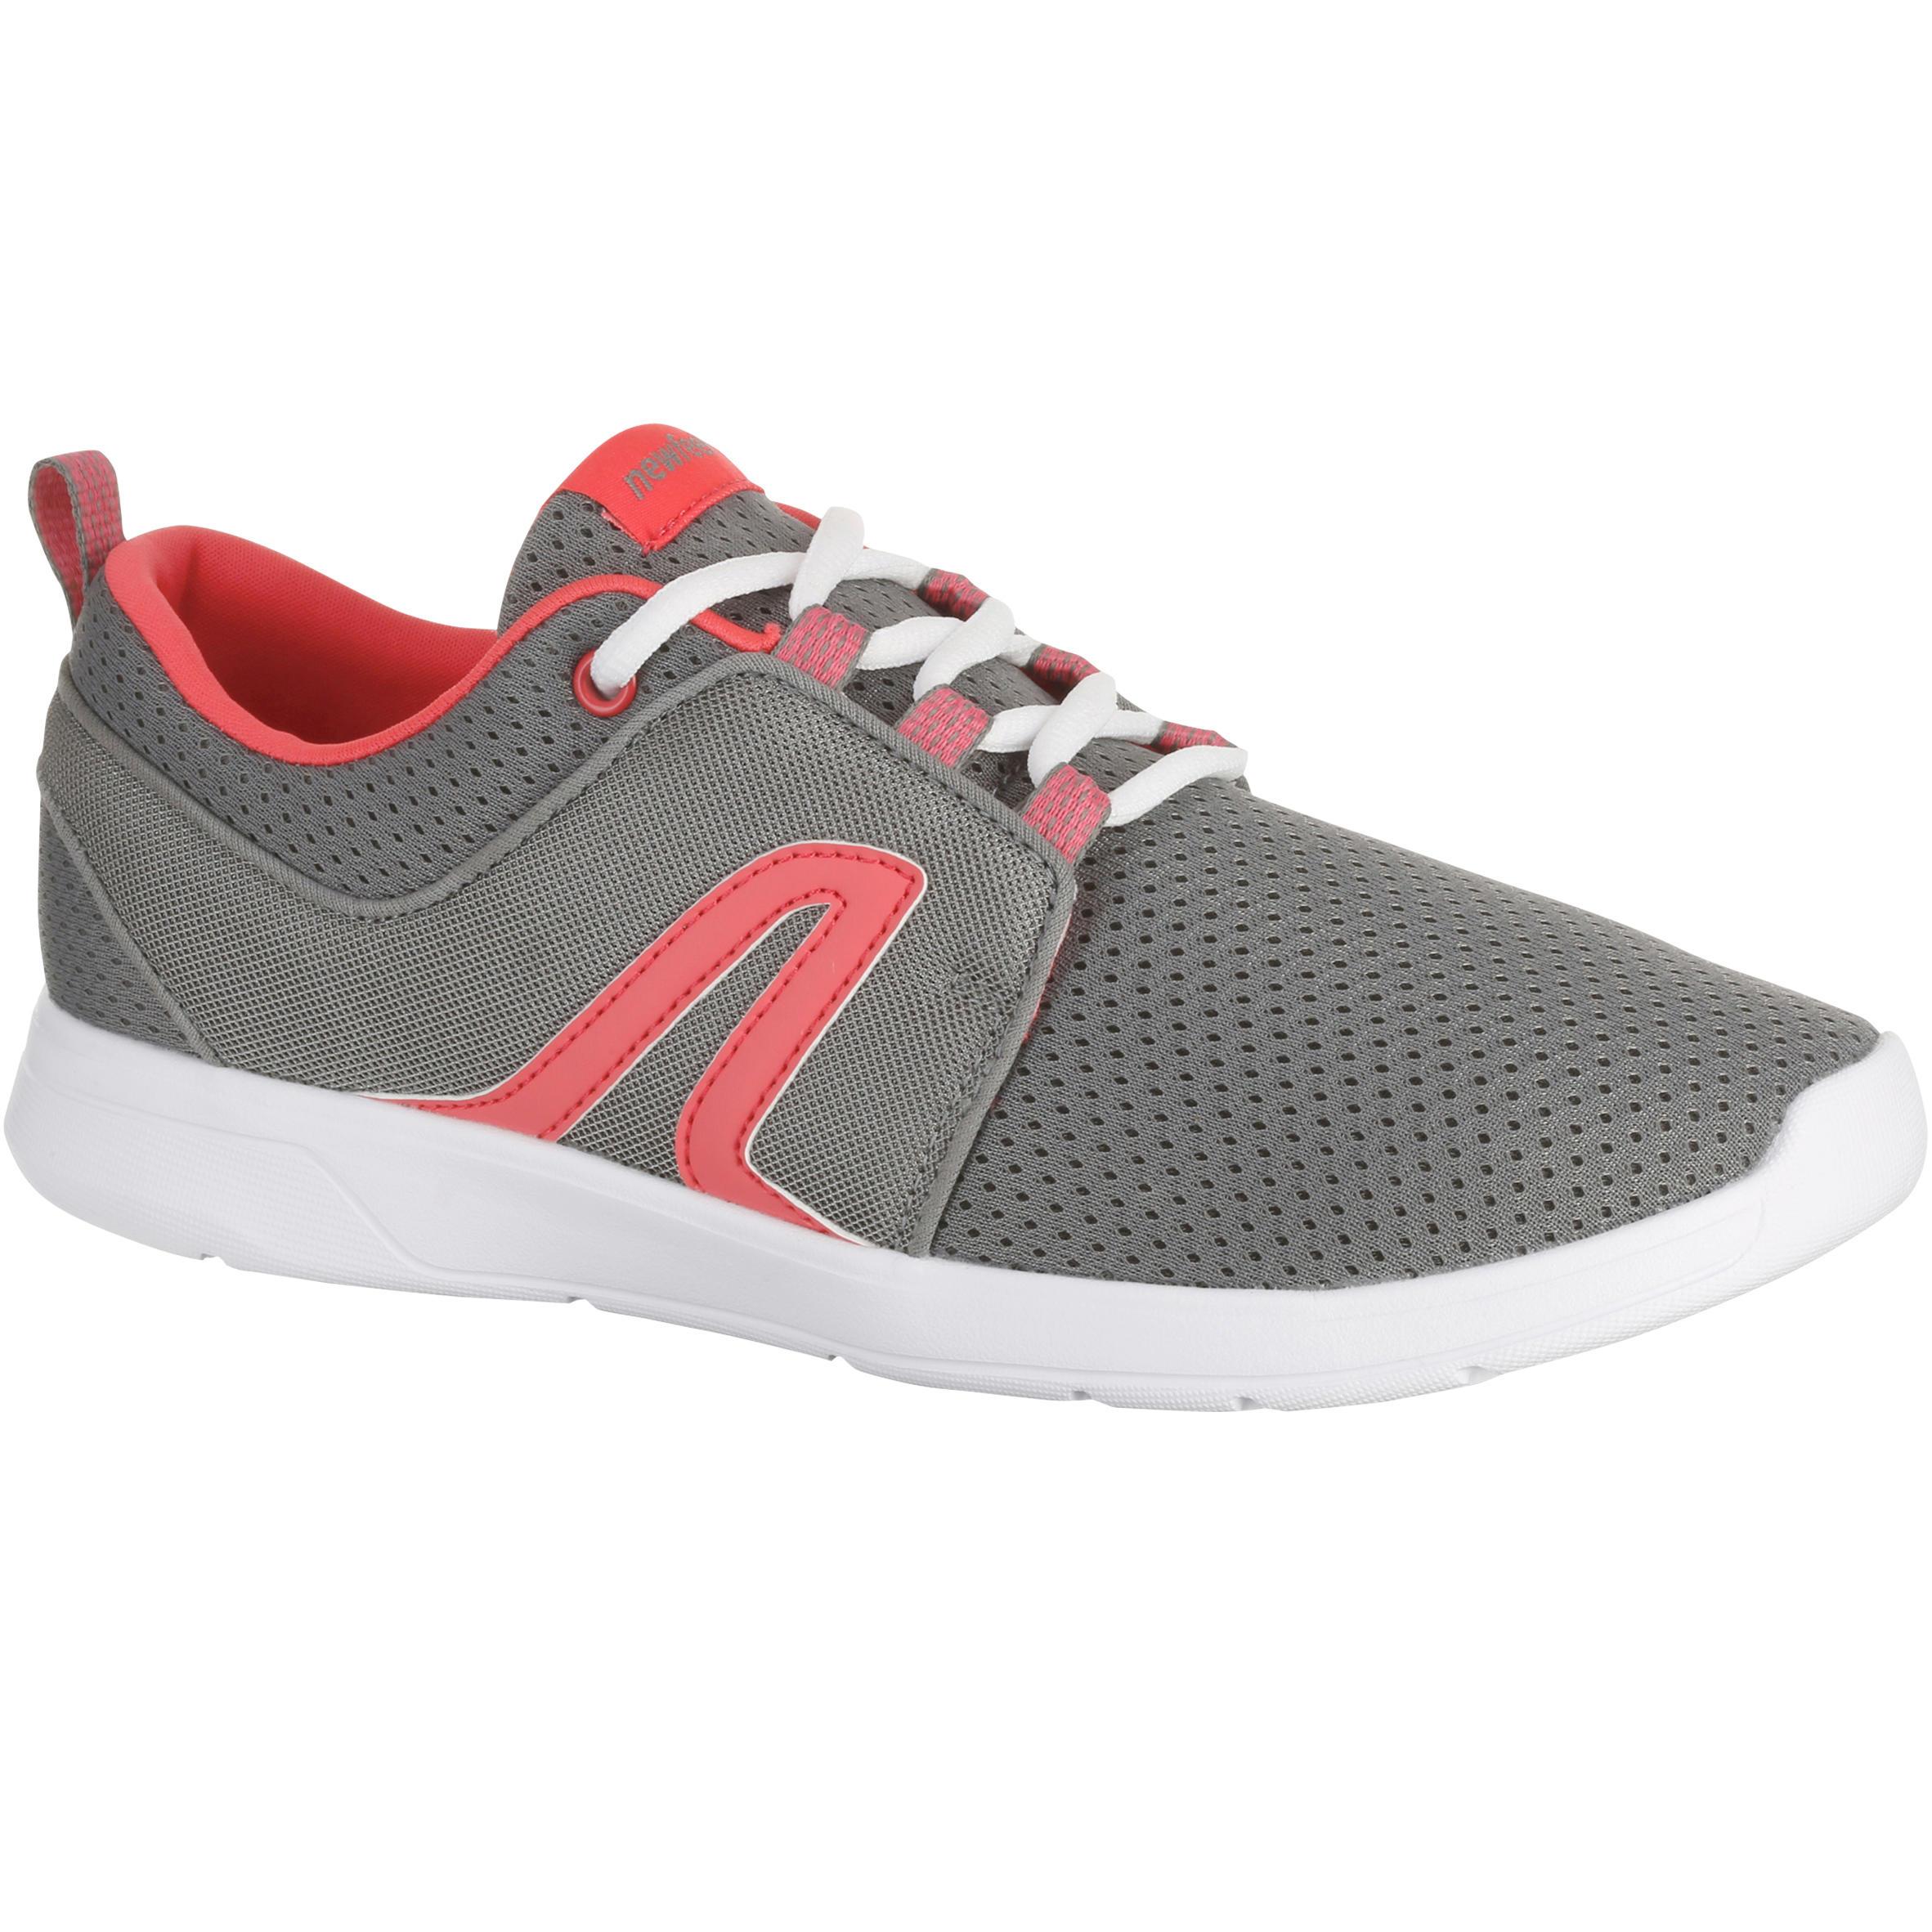 Tenis para caminata activa mujer Soft 140 verano gris / rosa